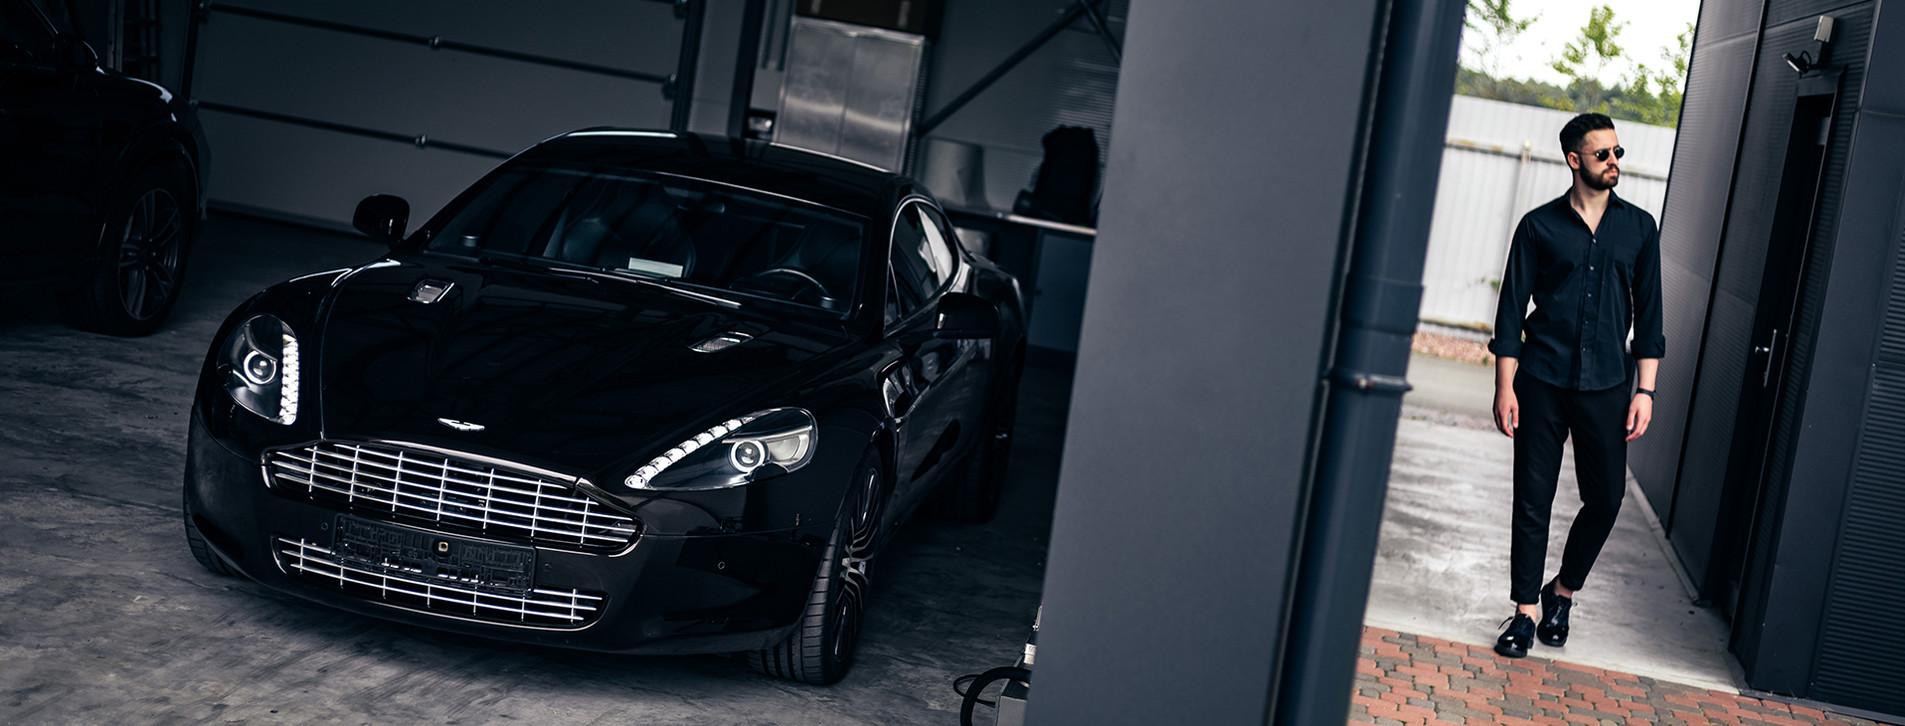 Фото 1 - Тест-драйв Aston Martin